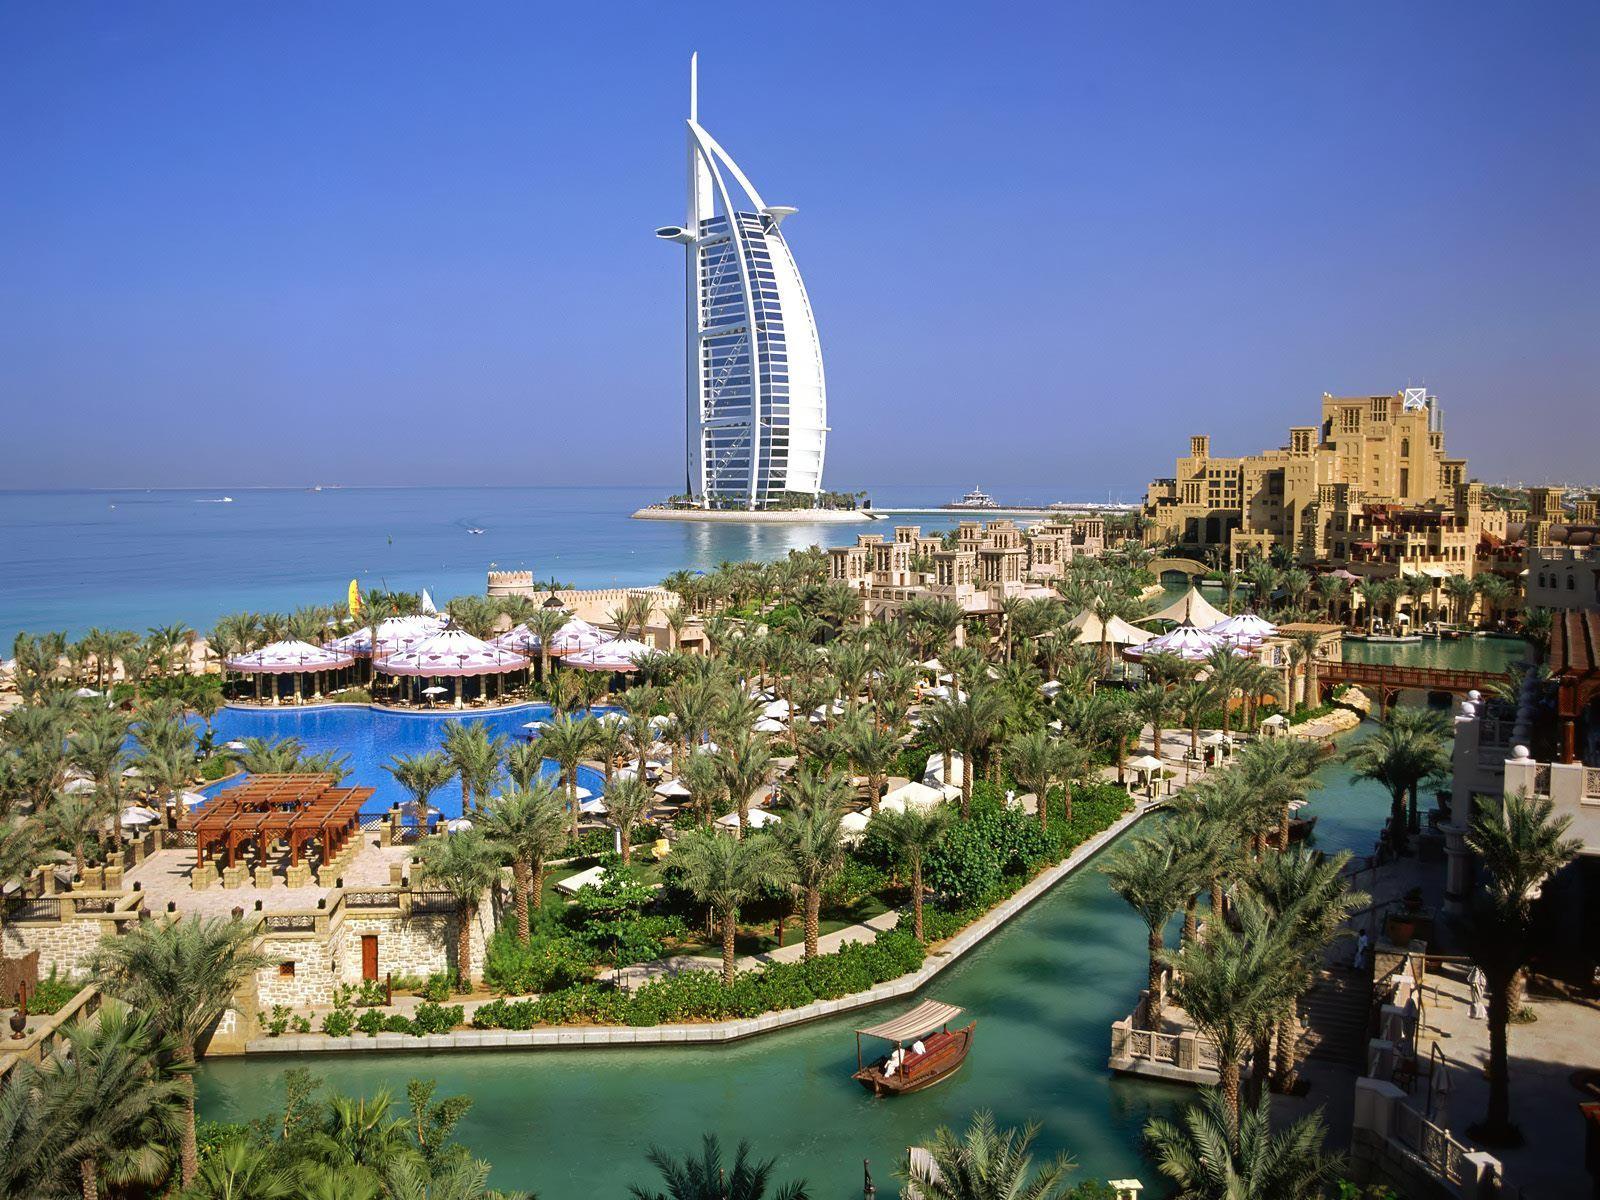 http://4.bp.blogspot.com/-DpZXuZWA6a0/TqC44qMw4gI/AAAAAAAAAVY/z9zPbHXVHWg/s1600/burj_al_arab_hotel_dubai-normal.jpg